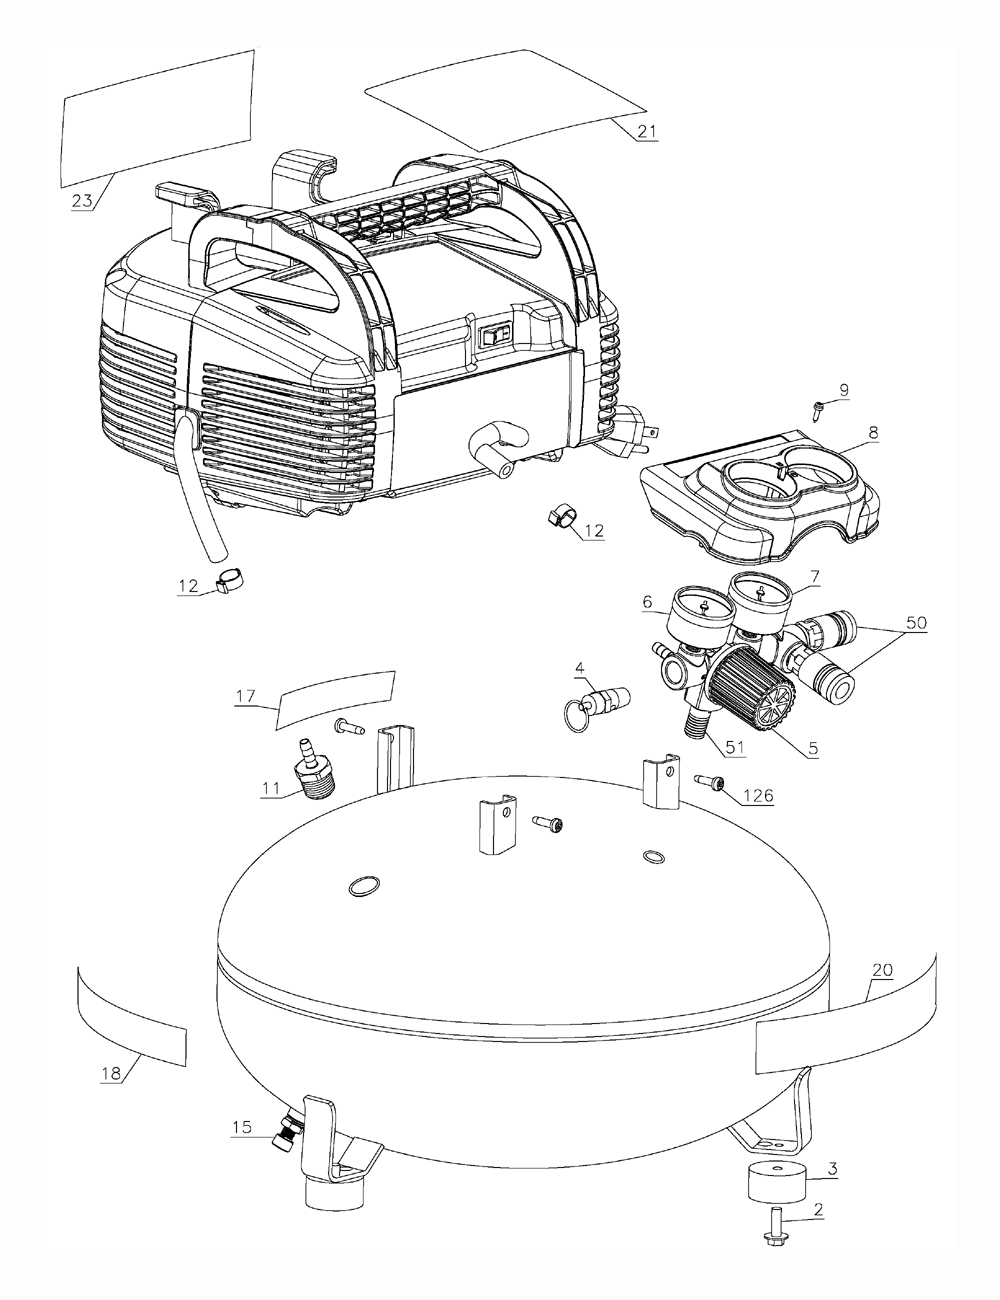 Porter Cable C2002 Type 9 Parts List Air Compressor Schematic